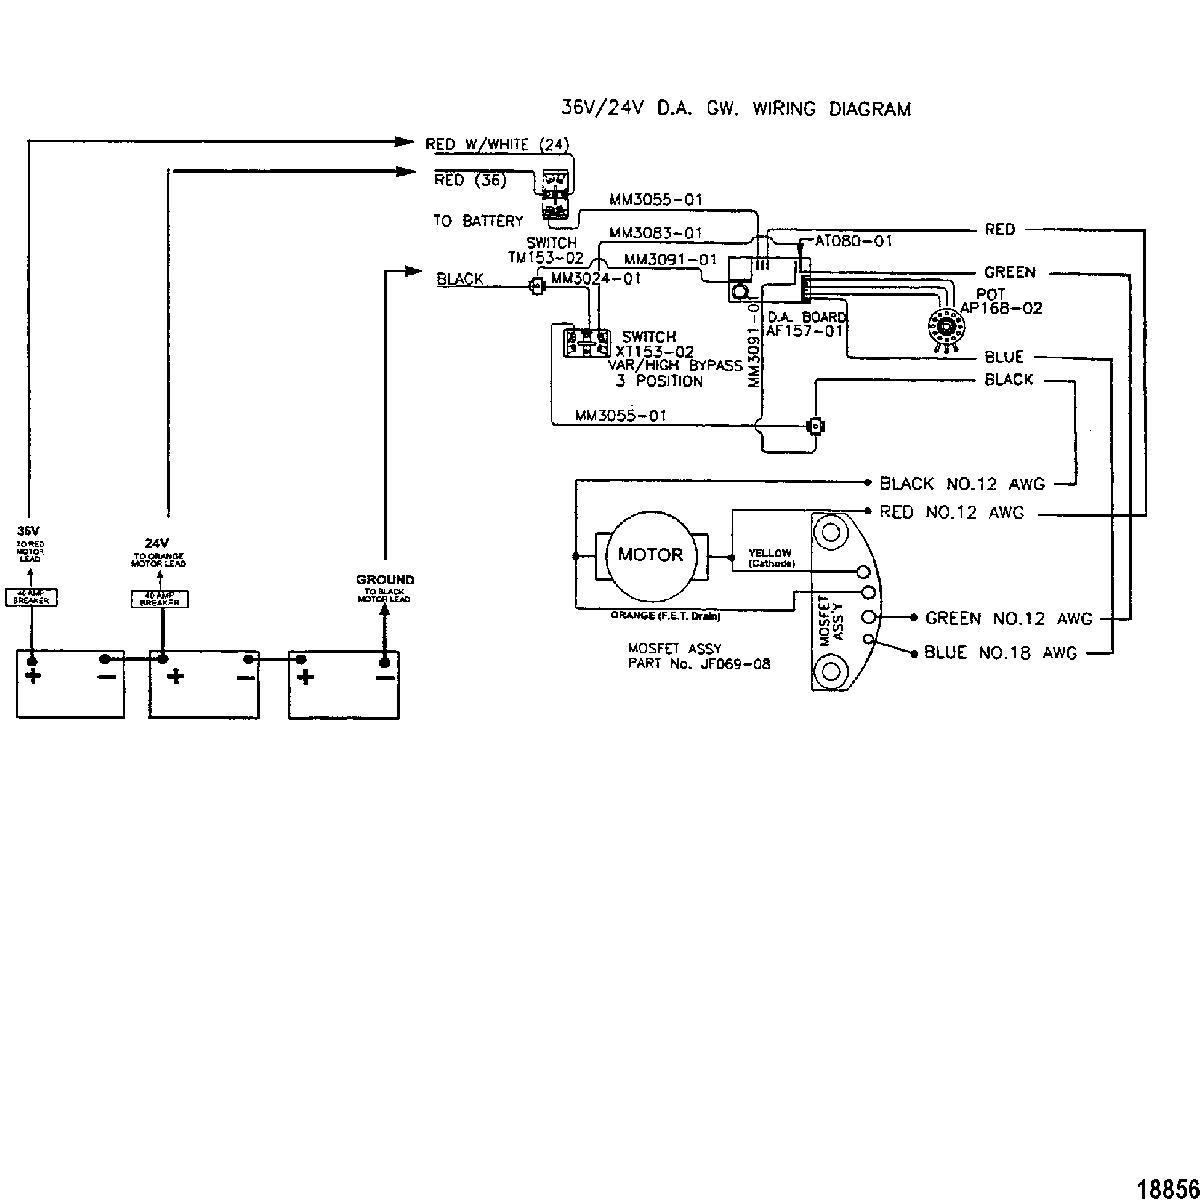 trolling motor wiring guide mr 7893  24 volt trolling motor wiring diagram on motorguide 12 24  24 volt trolling motor wiring diagram